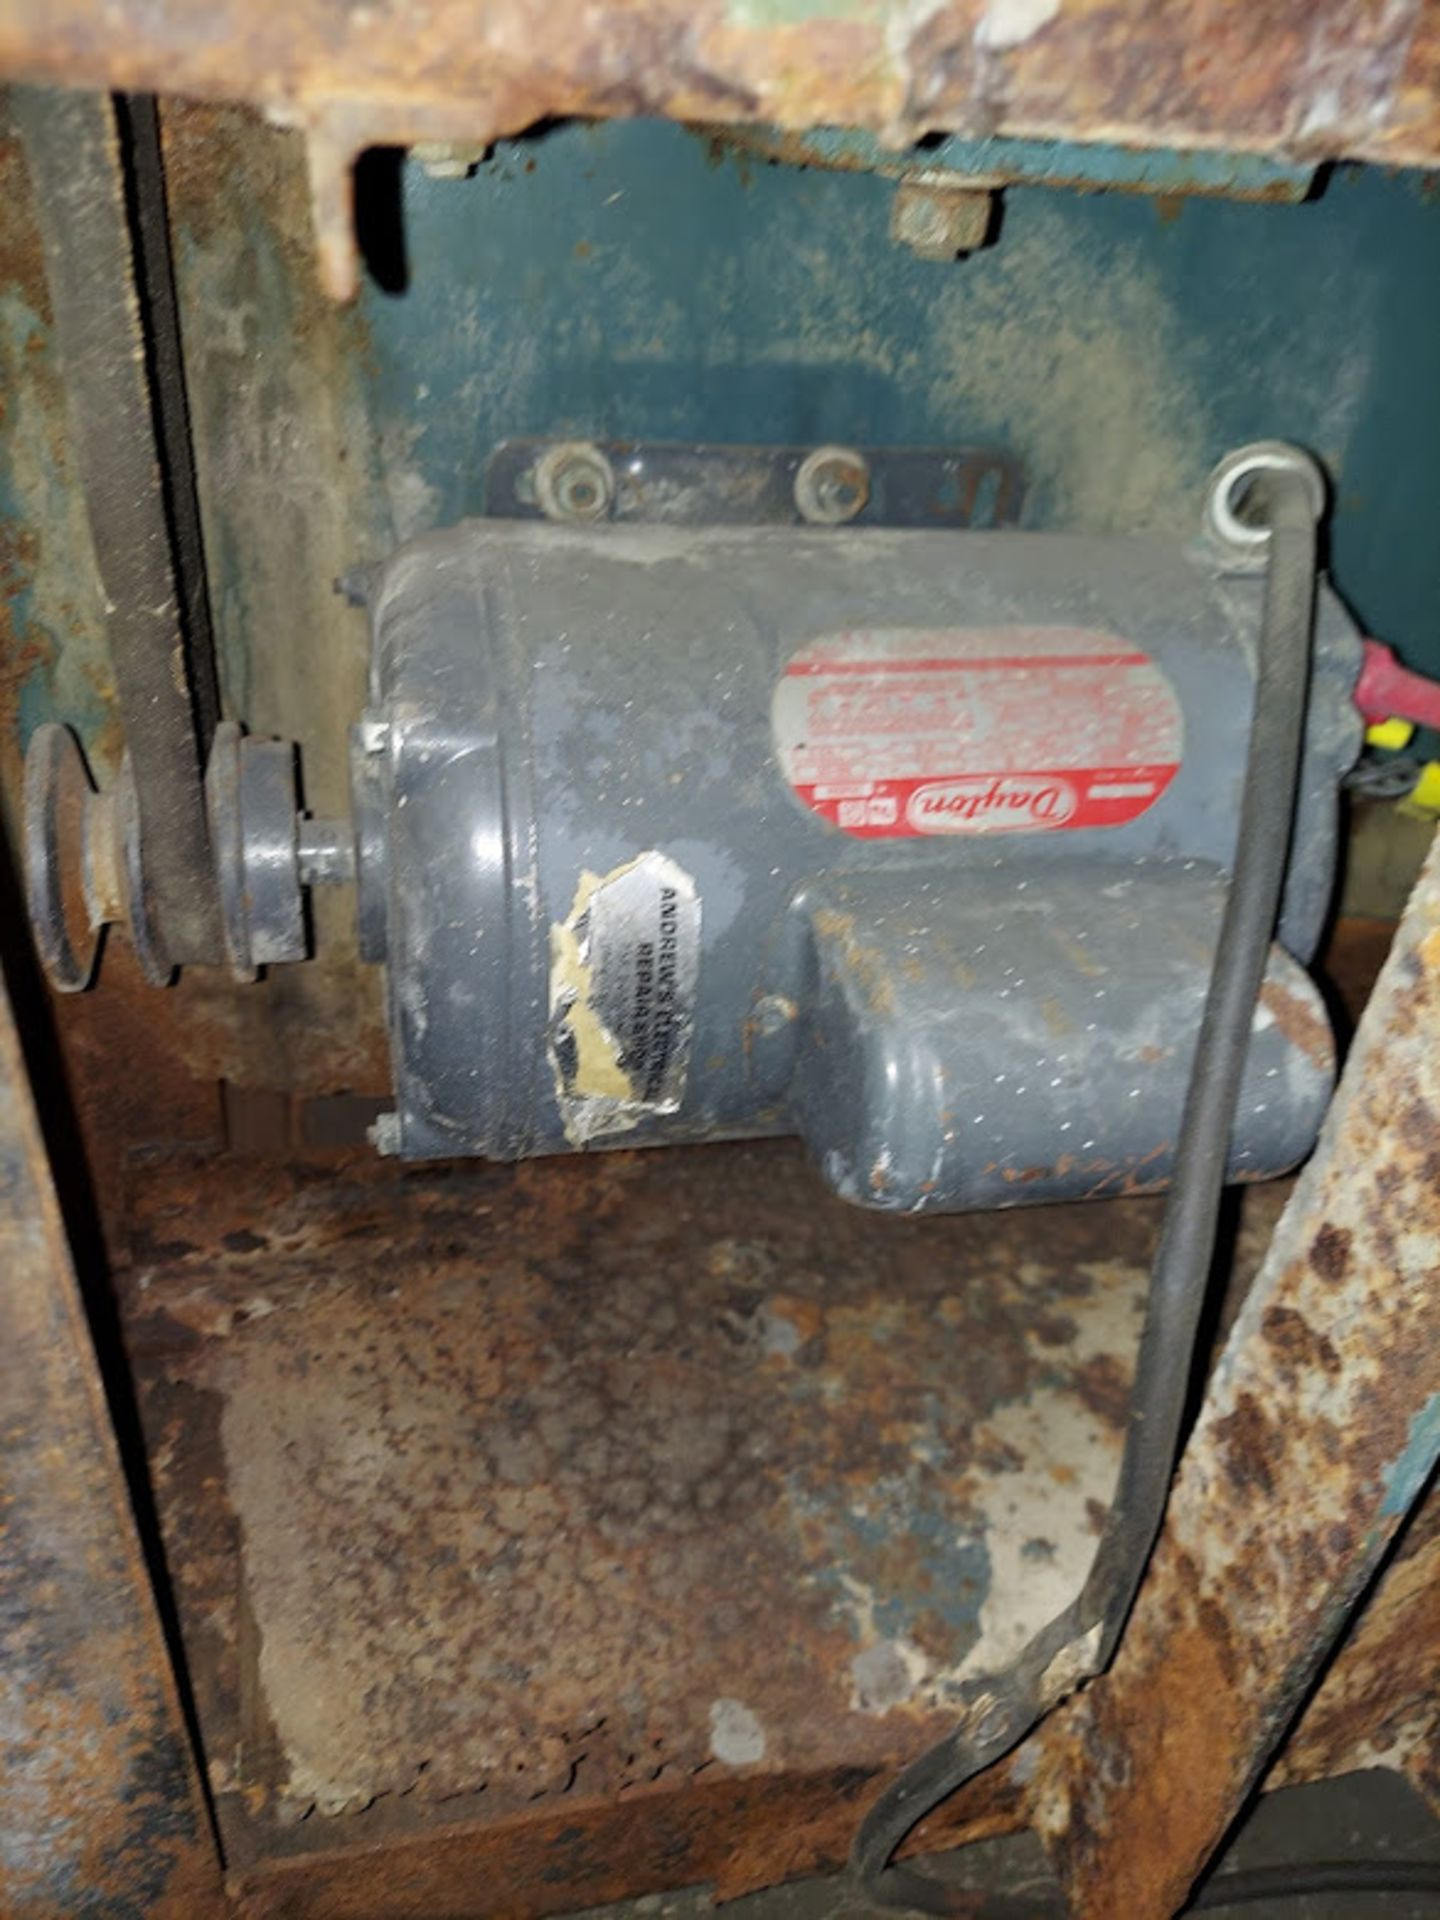 "Somaca 106"" Wet Abrasive Belt Machine with Roller Platen, Model # BM-1060-RP, 115 Volts - Image 4 of 4"